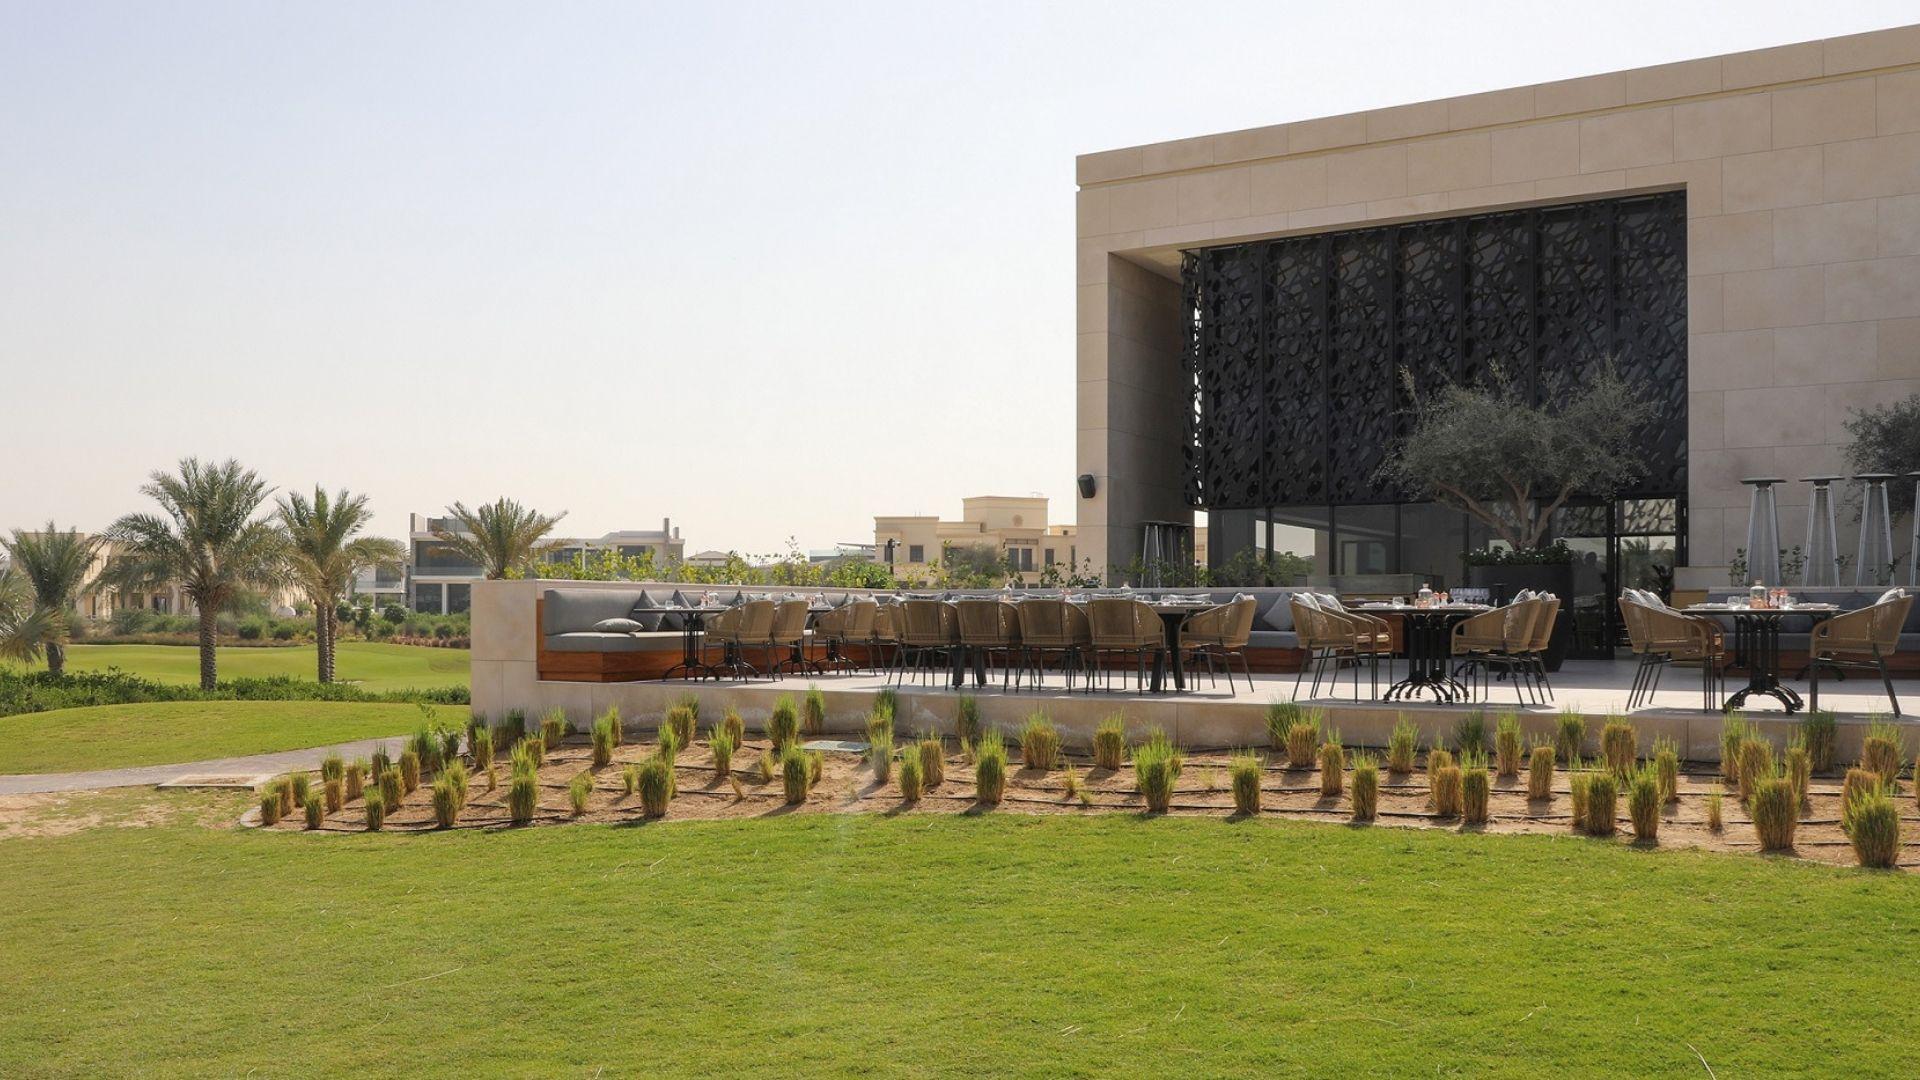 Hillhouse-Brasserie-Brunch-Exterior-Golf-Club-Terrace-View-Dubai